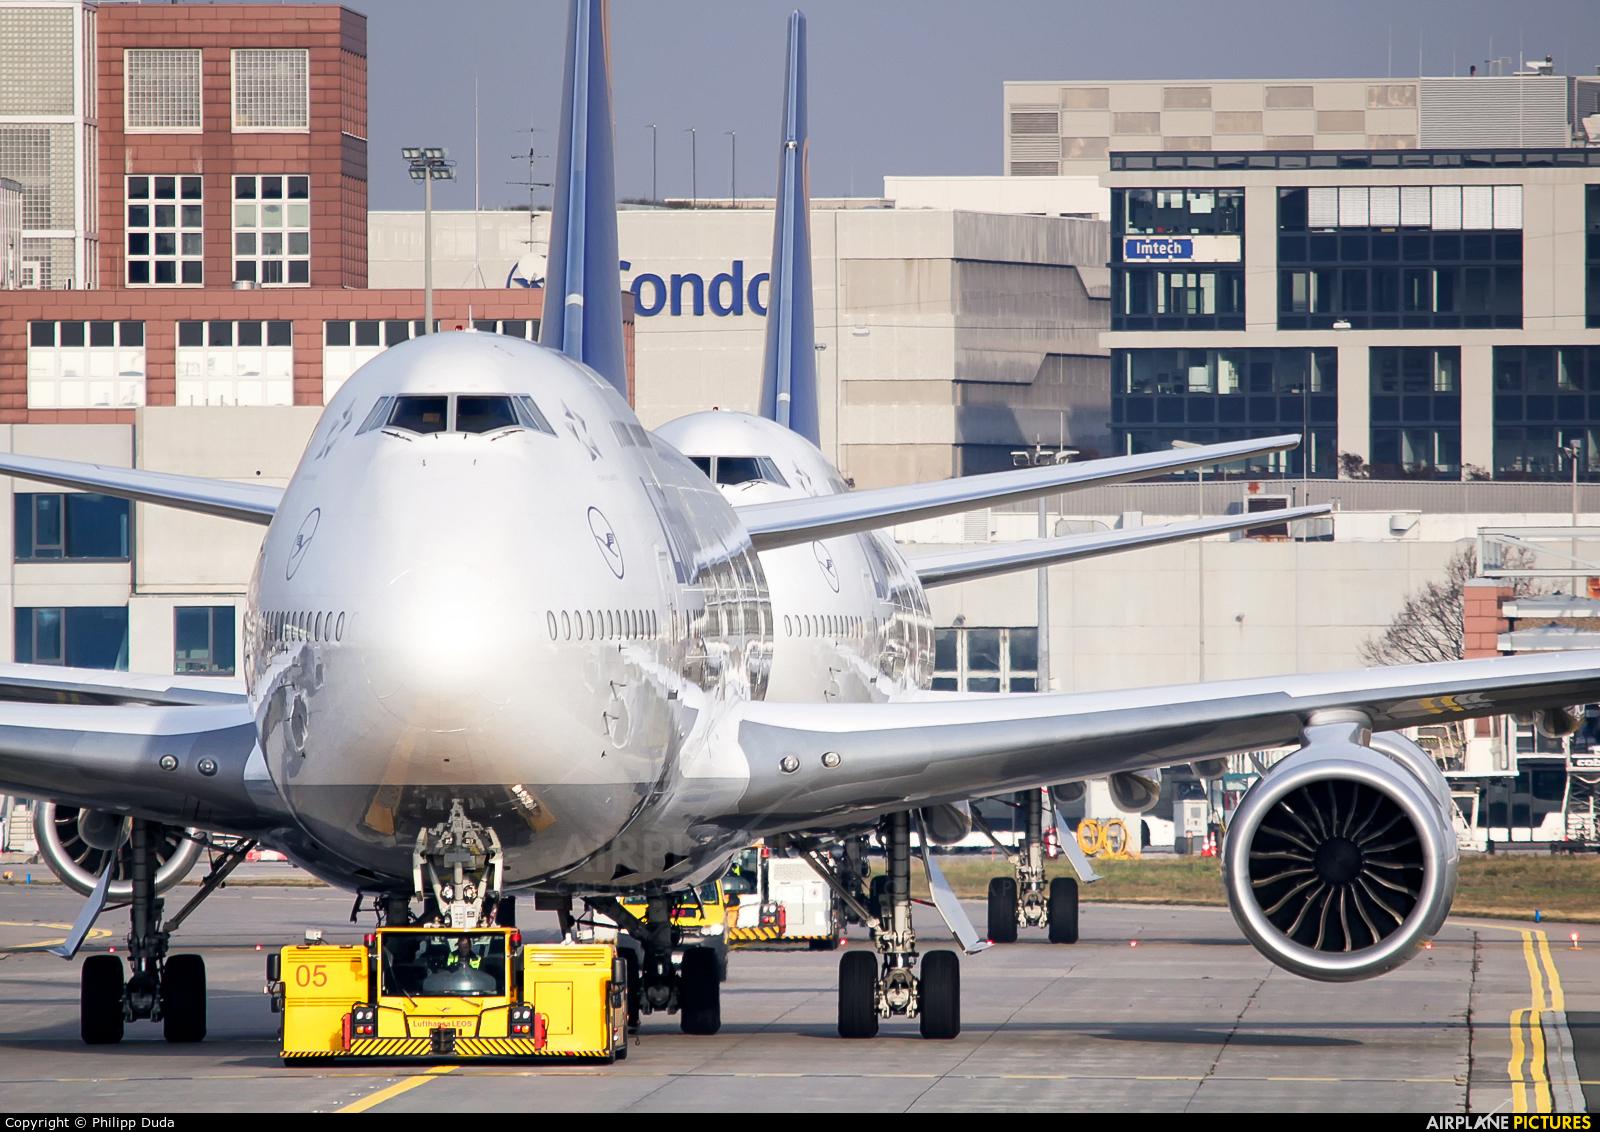 Lufthansa D-ABYR aircraft at Frankfurt